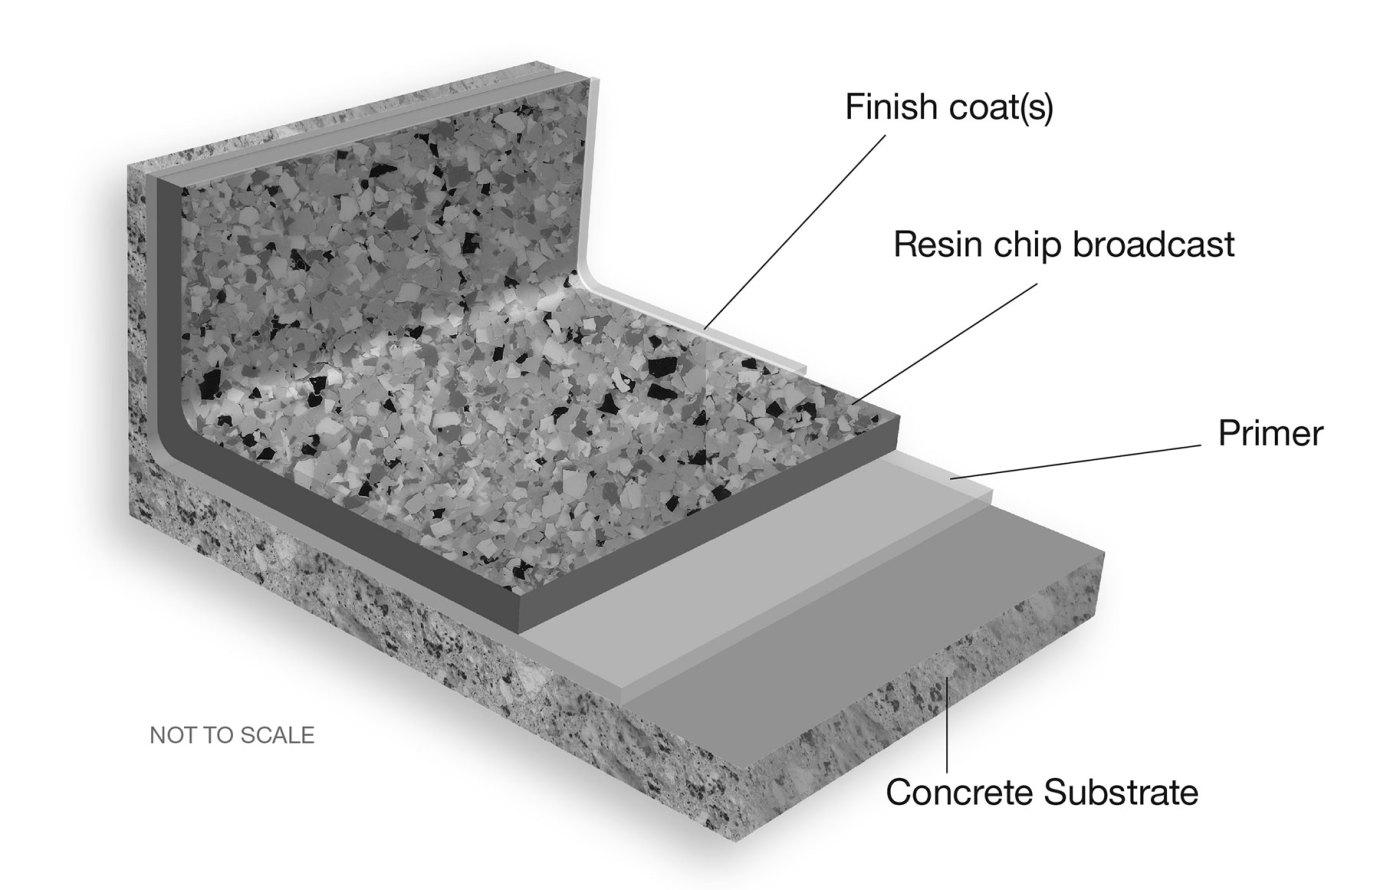 Resin Chip Epoxy Floor Coating System